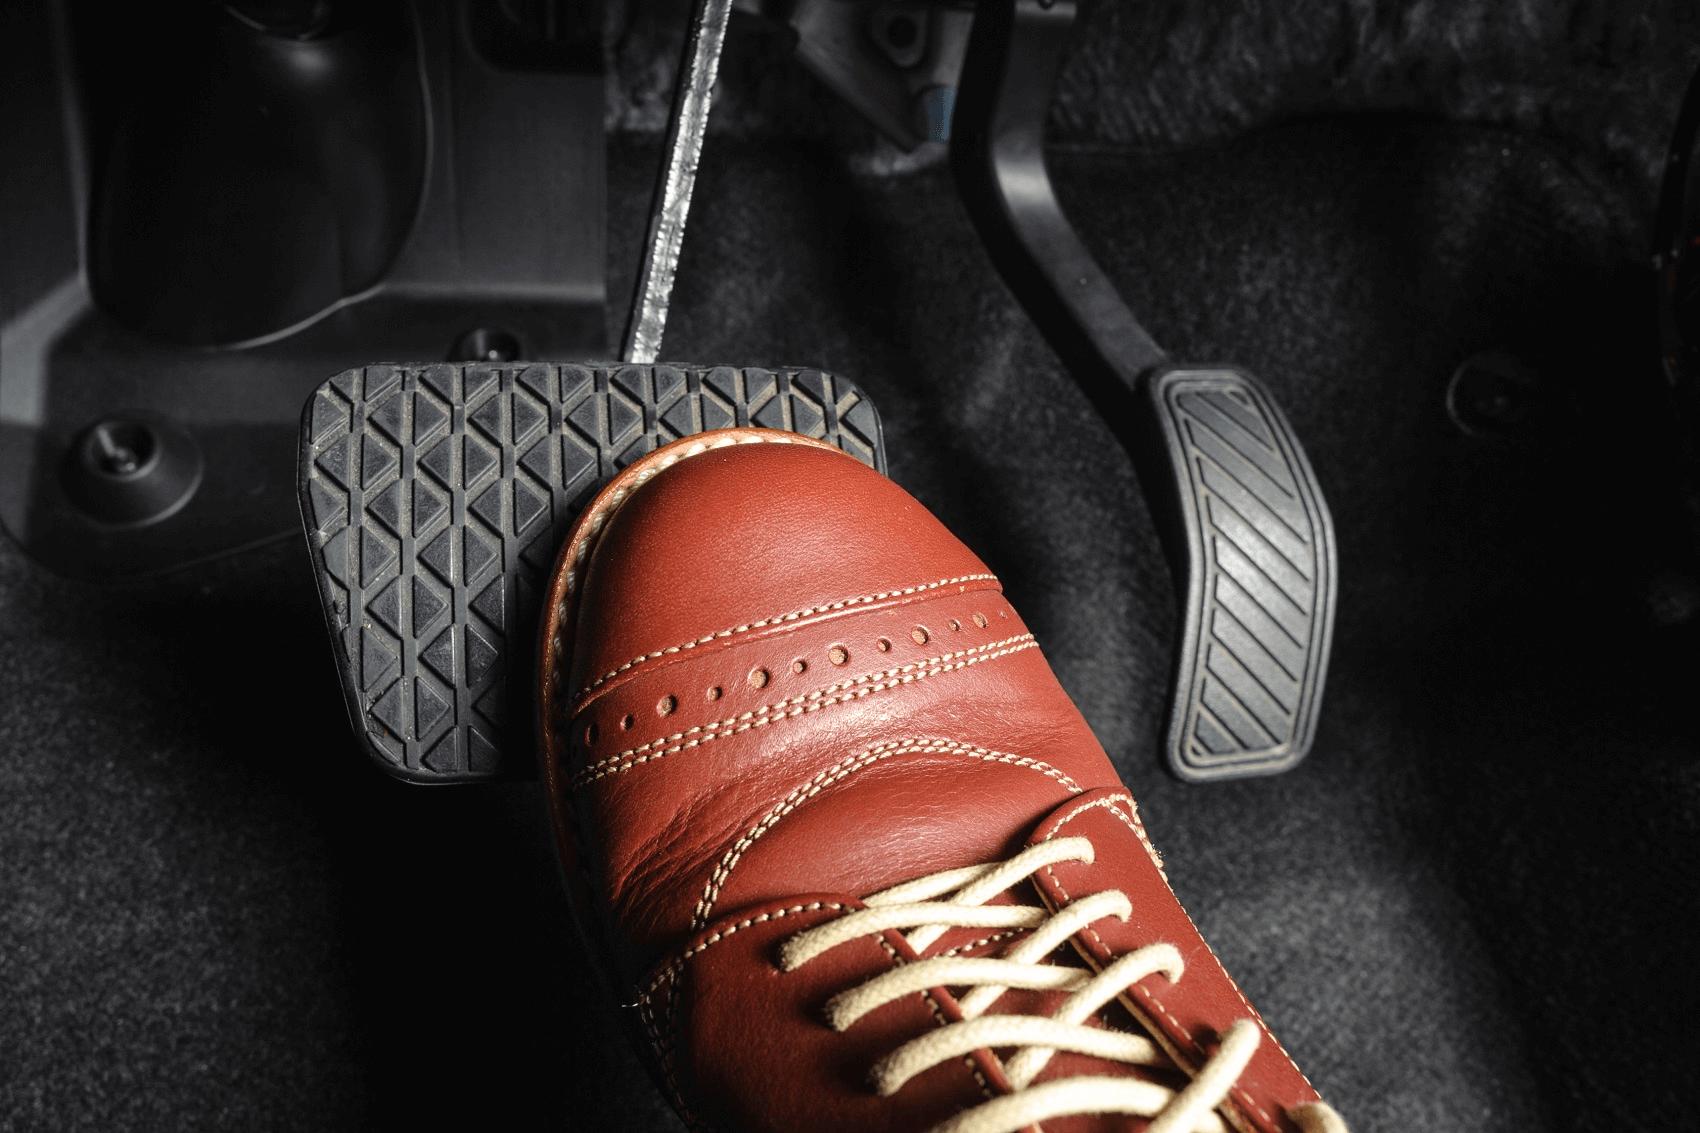 Foot Pressing Brakes